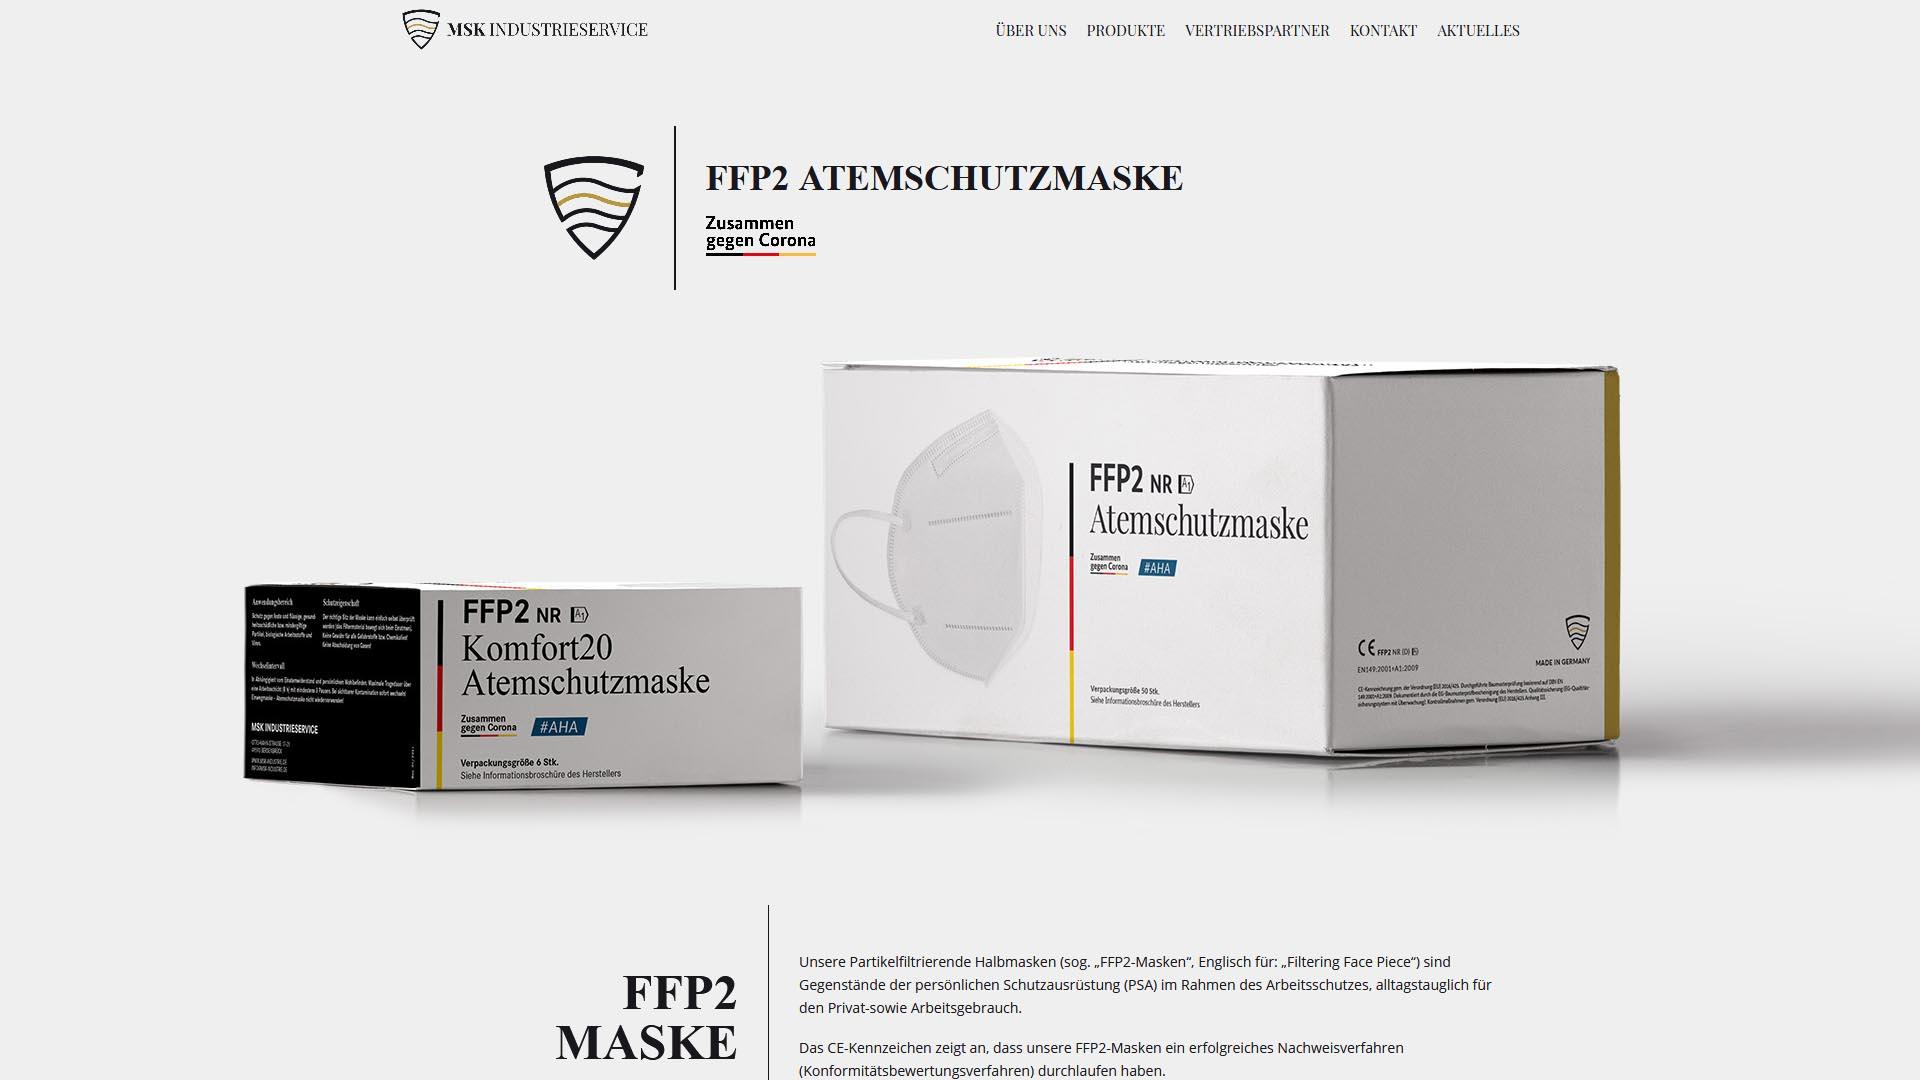 msk industrieservice atemschutzmasken ffp2 relaunch 5